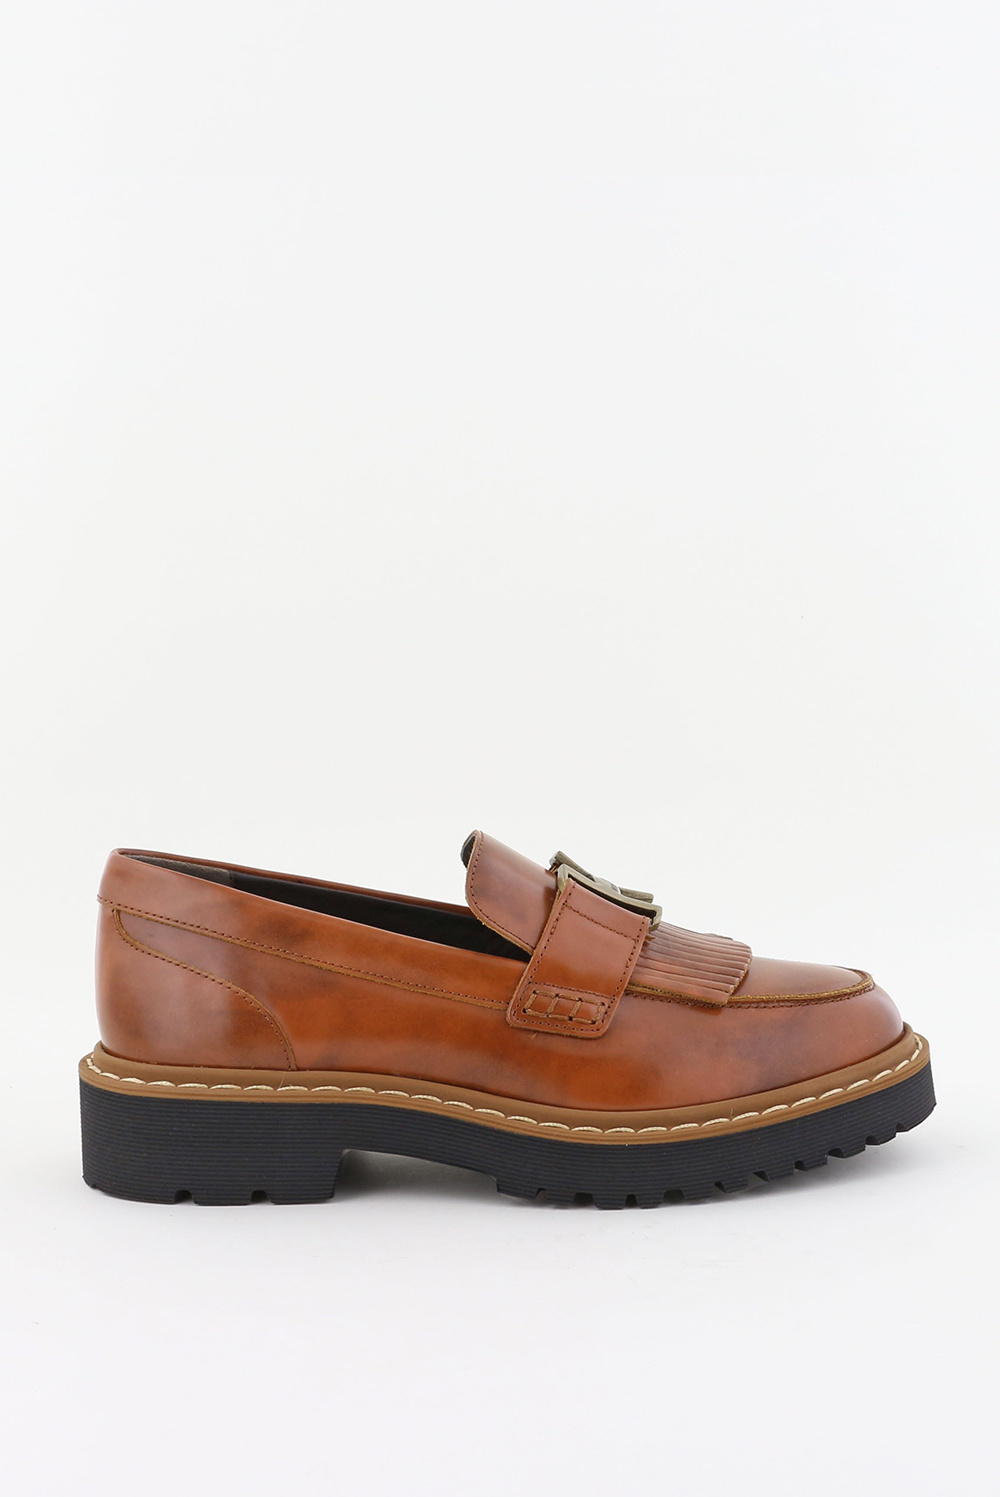 Hogan loafers HXW5430DH72Q cognac